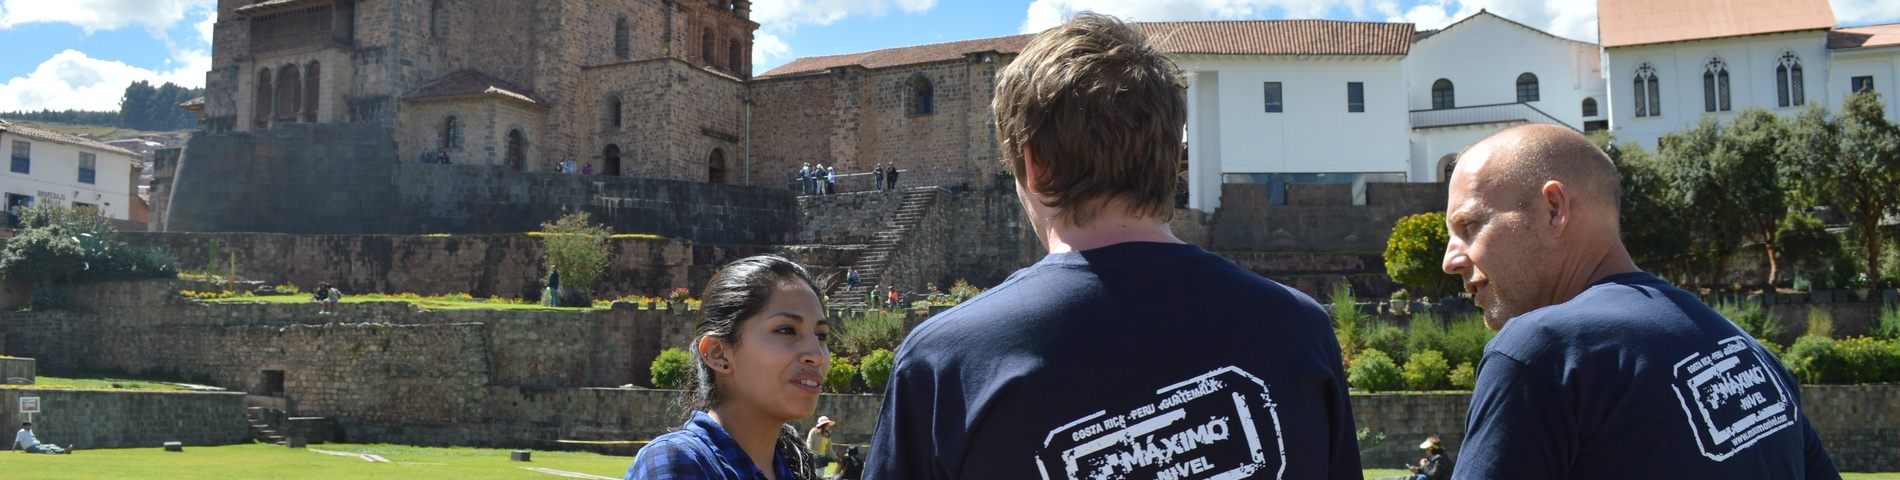 webová stránka španělština voyeur